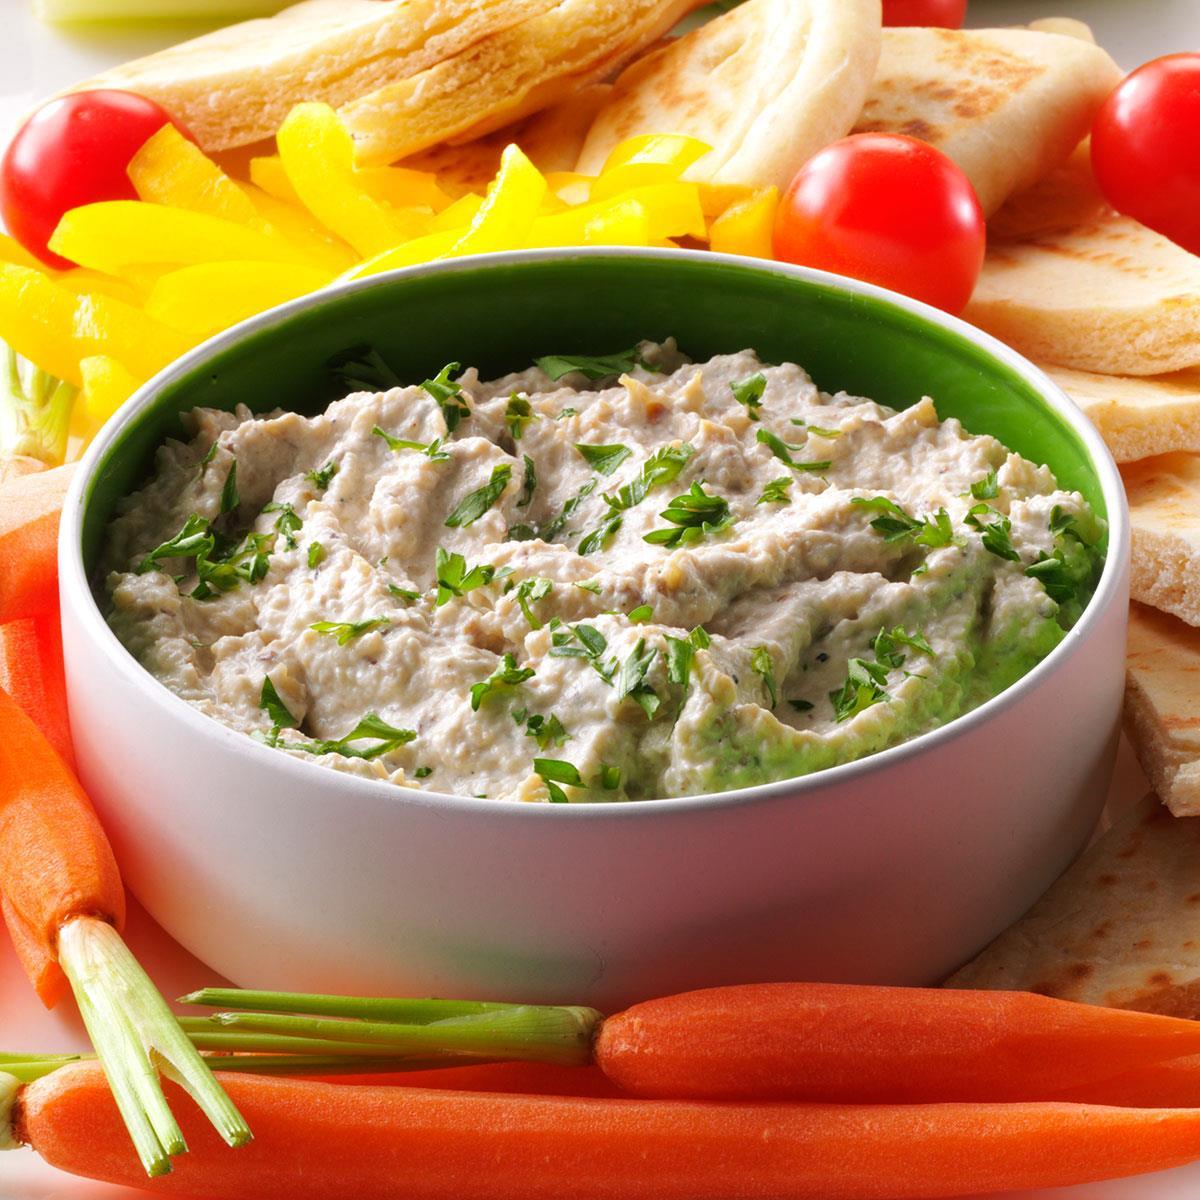 Mediterranean Style Recipes: Mediterranean Eggplant Dip Recipe